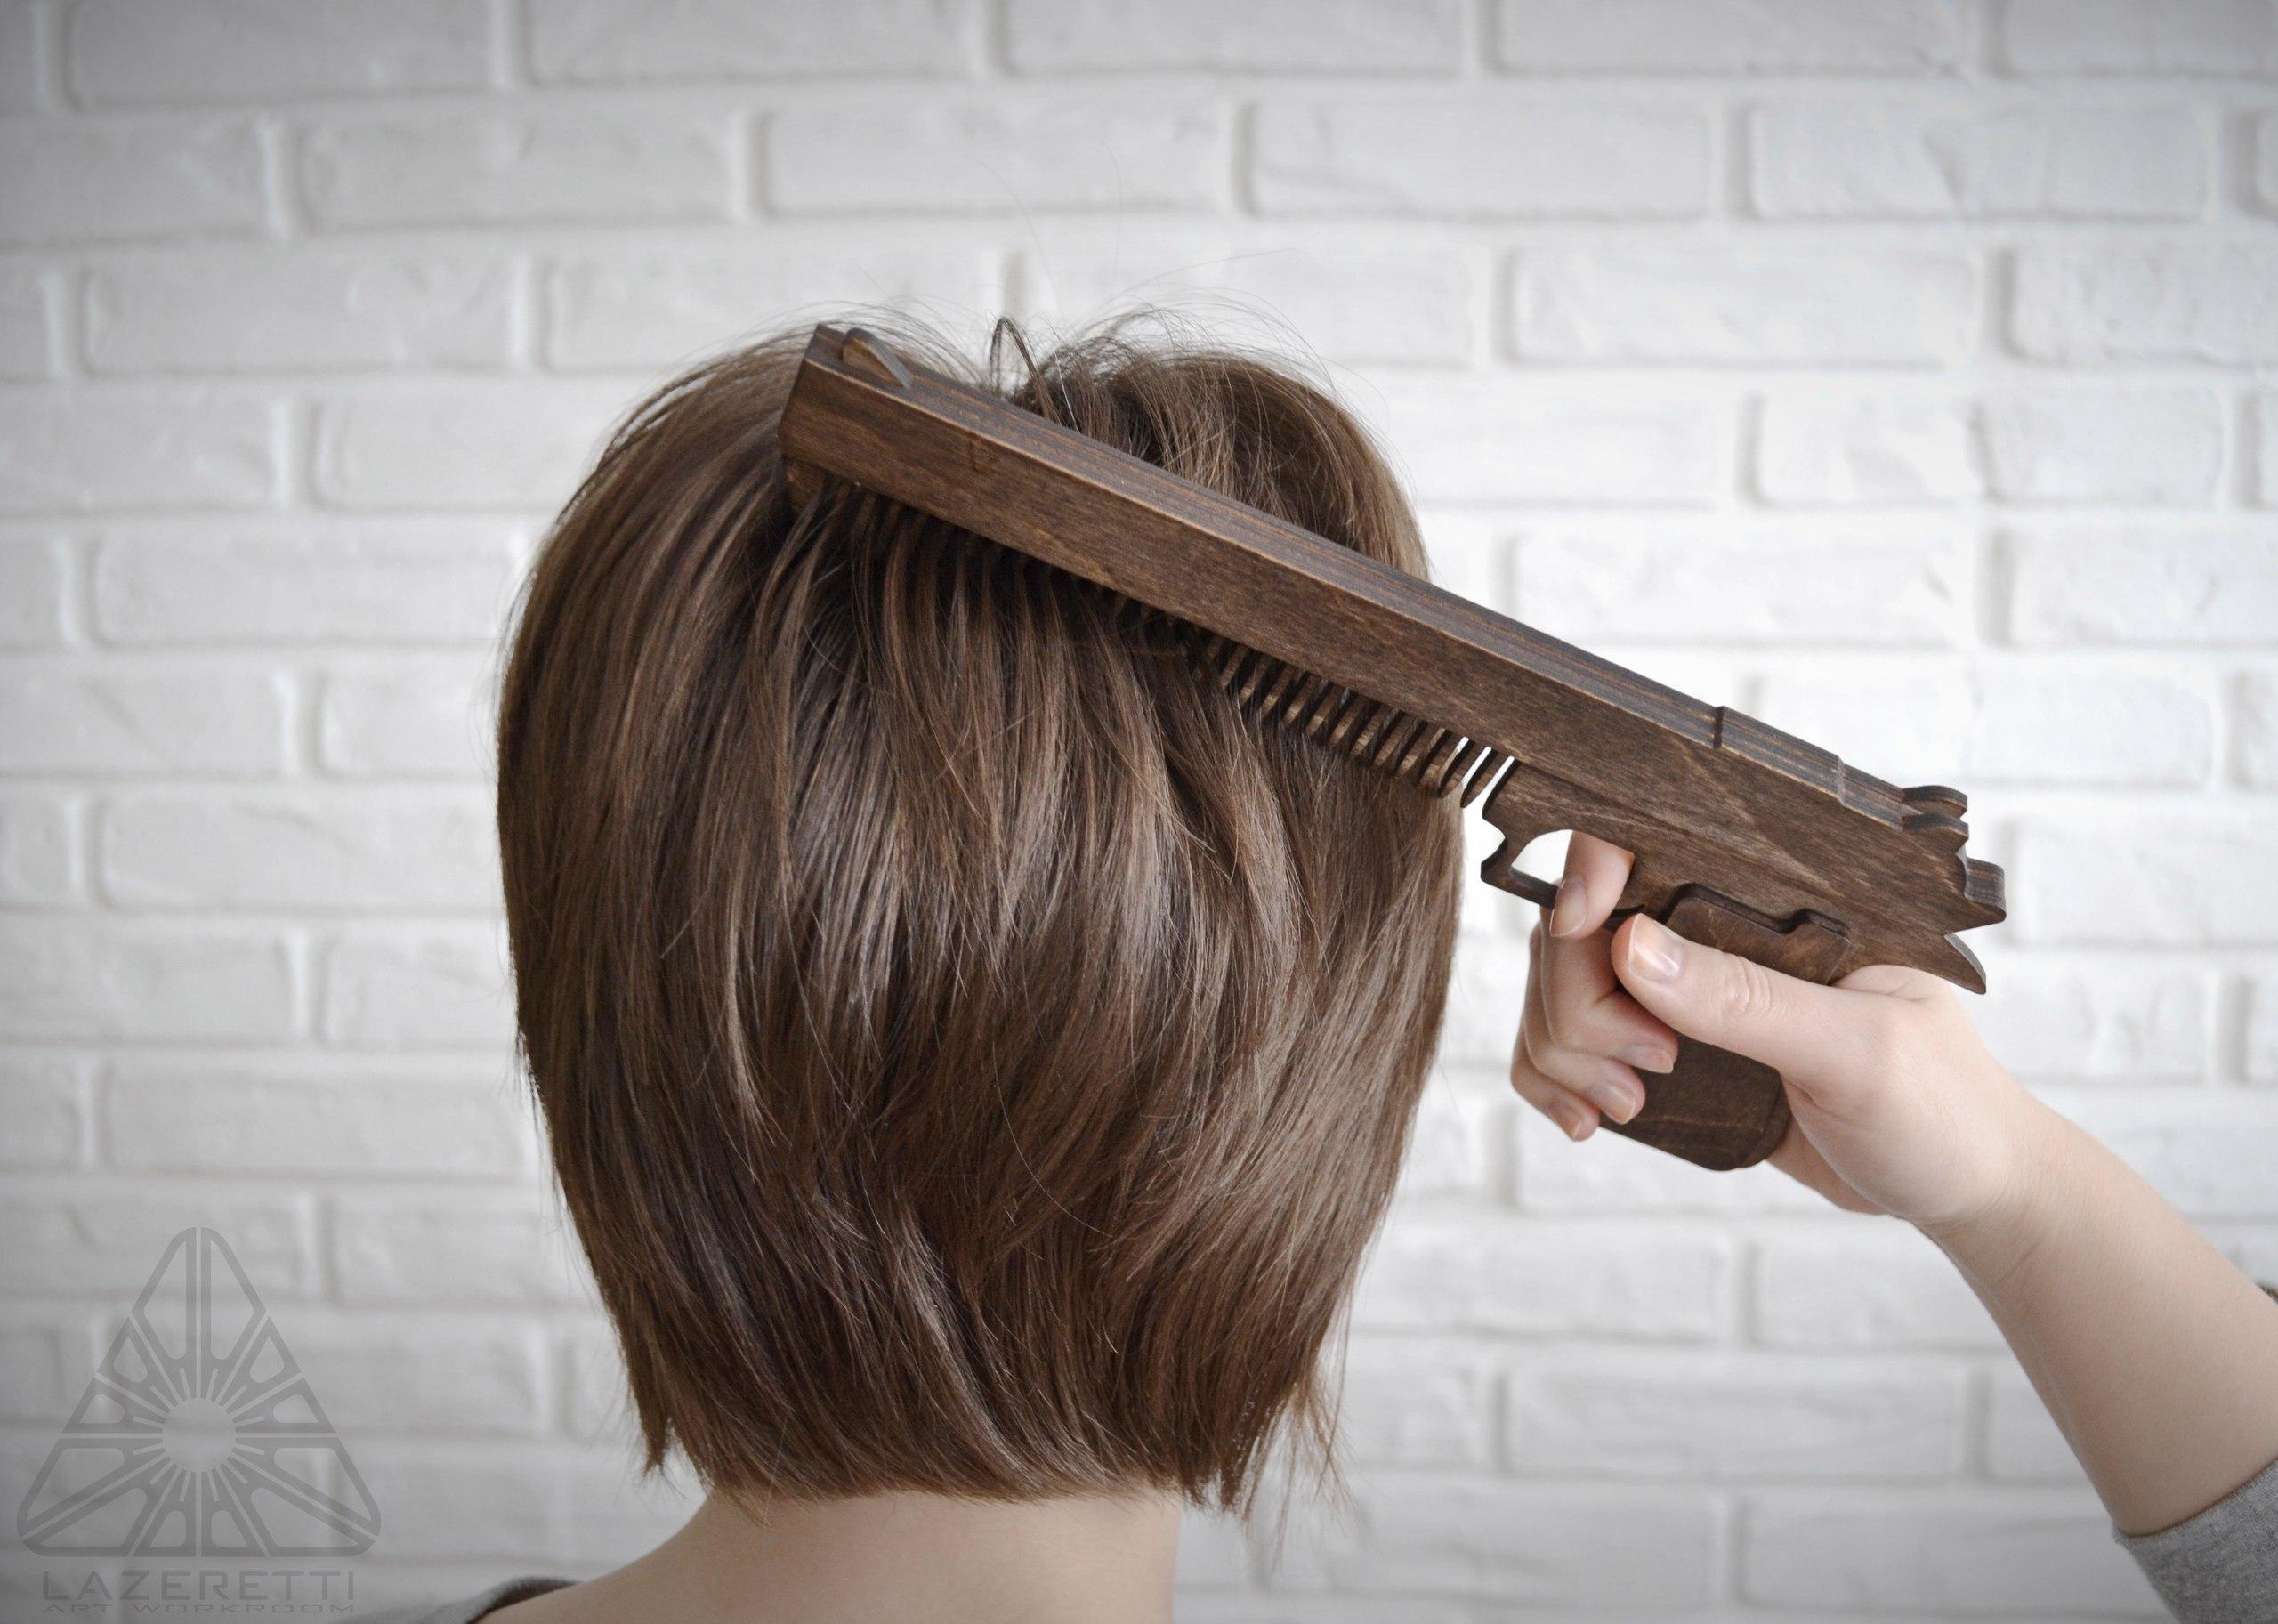 Laser Cut Gun Hair Comb Free Vector